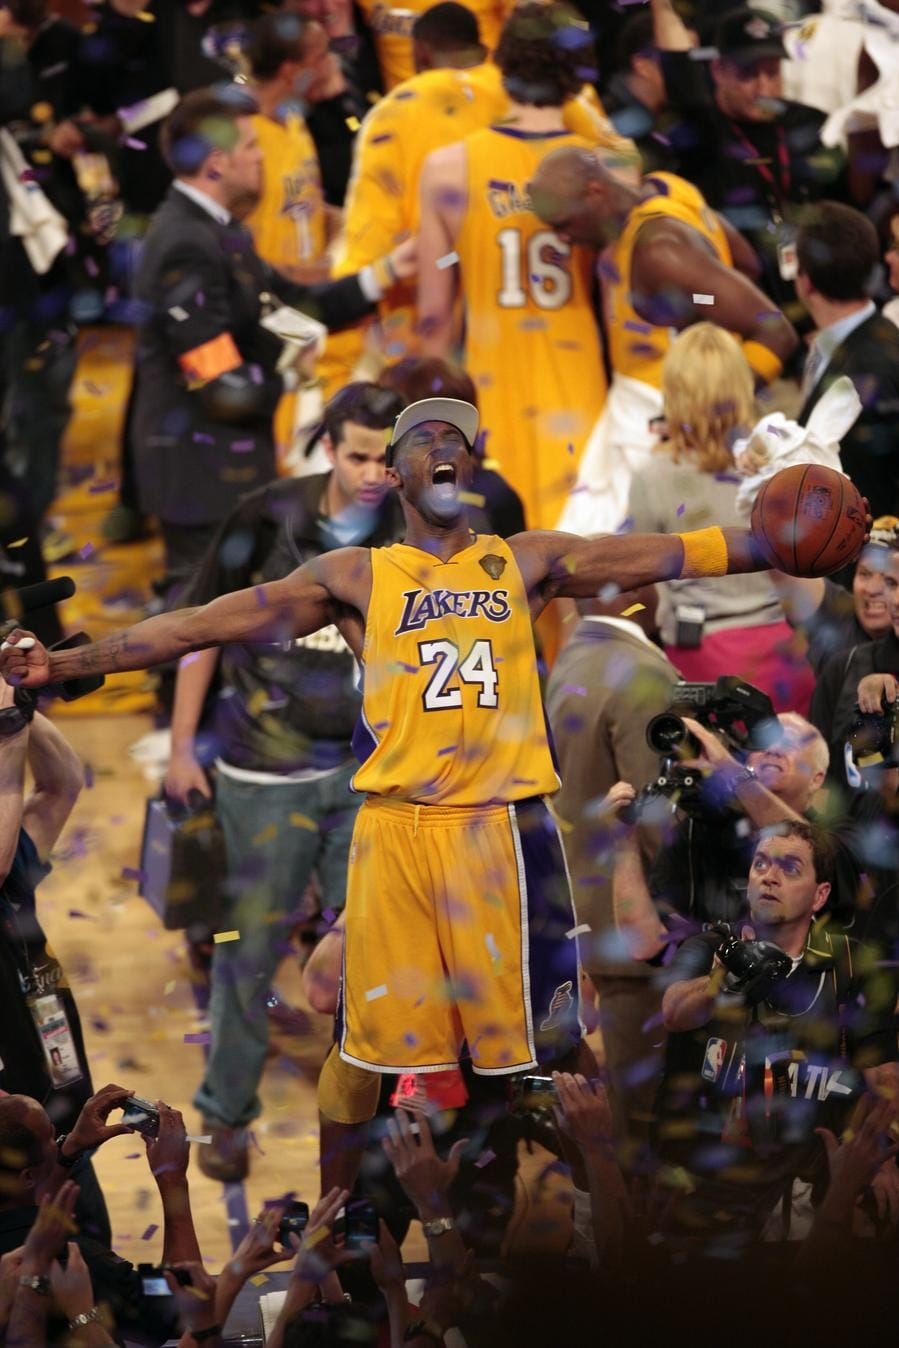 Kobe Bryant Championship Wallpapers Top Free Kobe Bryant Championship Backgrounds Wallpaperaccess